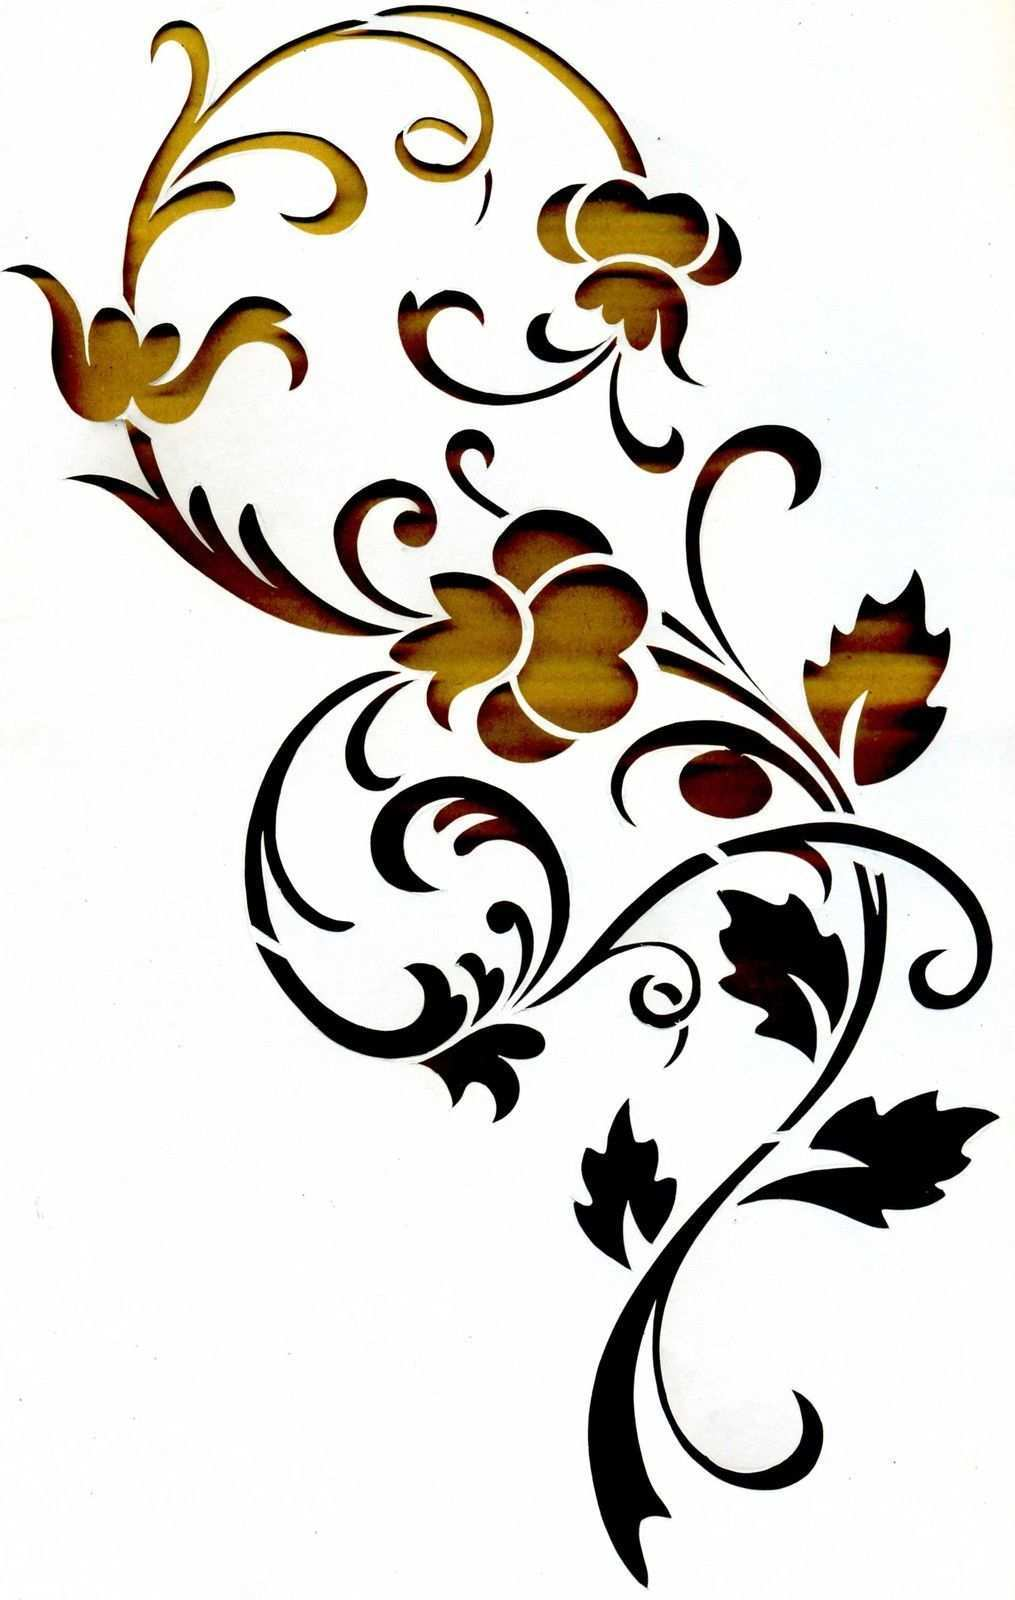 Wandschablonen Schablone Wandtattoo Ornament Ebay Wandschablonen Schablonen Schablonenmalerei